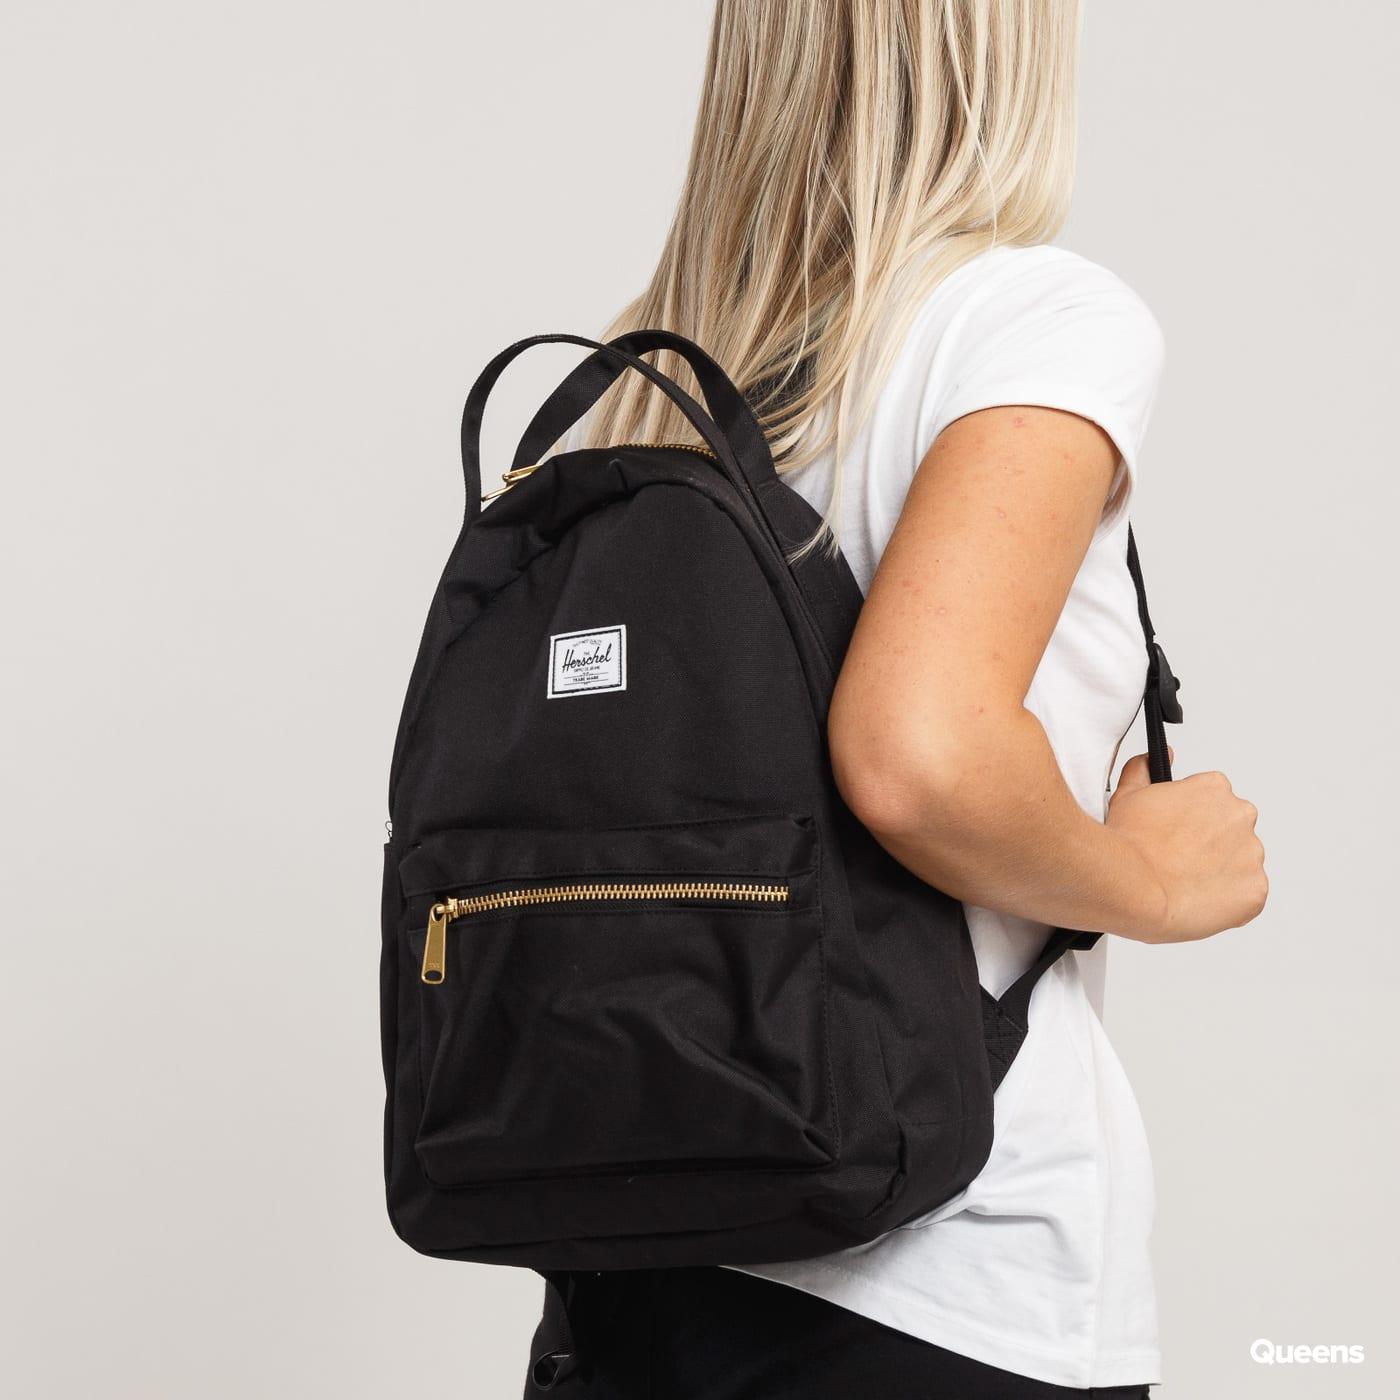 Batoh The Herschel Supply CO. Nova Small Backpack (10502